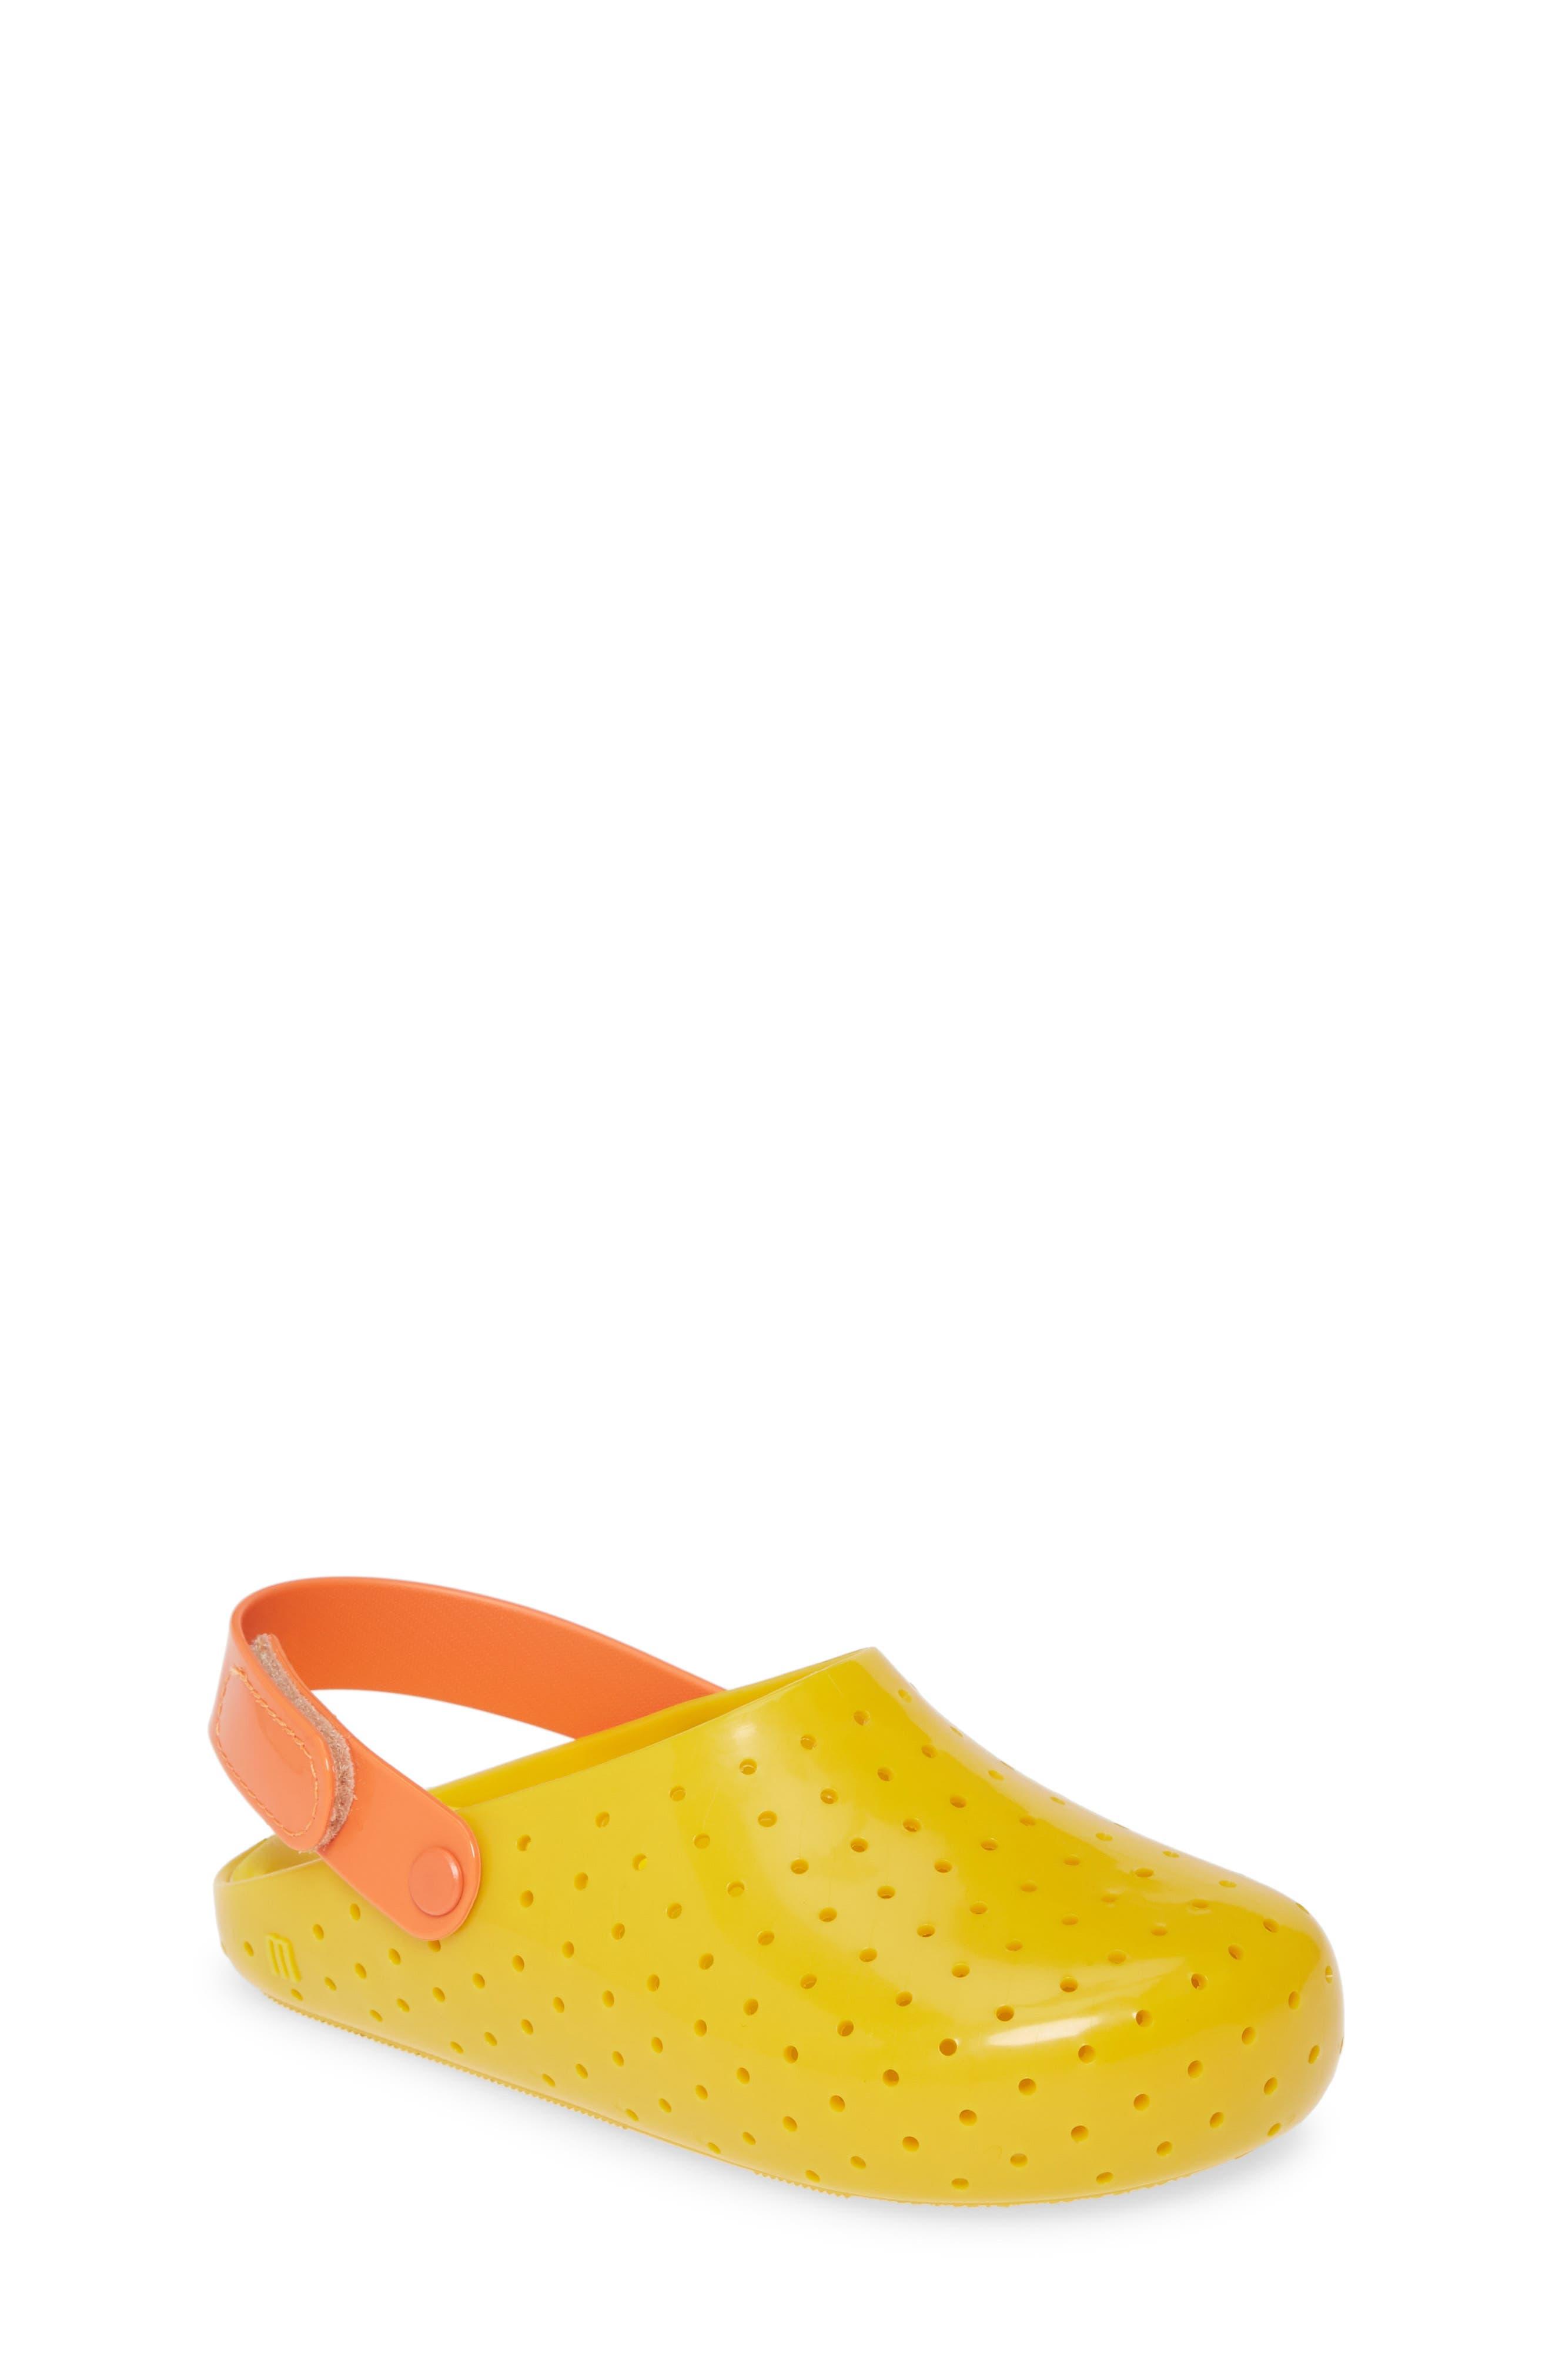 Toddler Girls Melissa Furandi Glitter Clog Size 7 M  Yellow